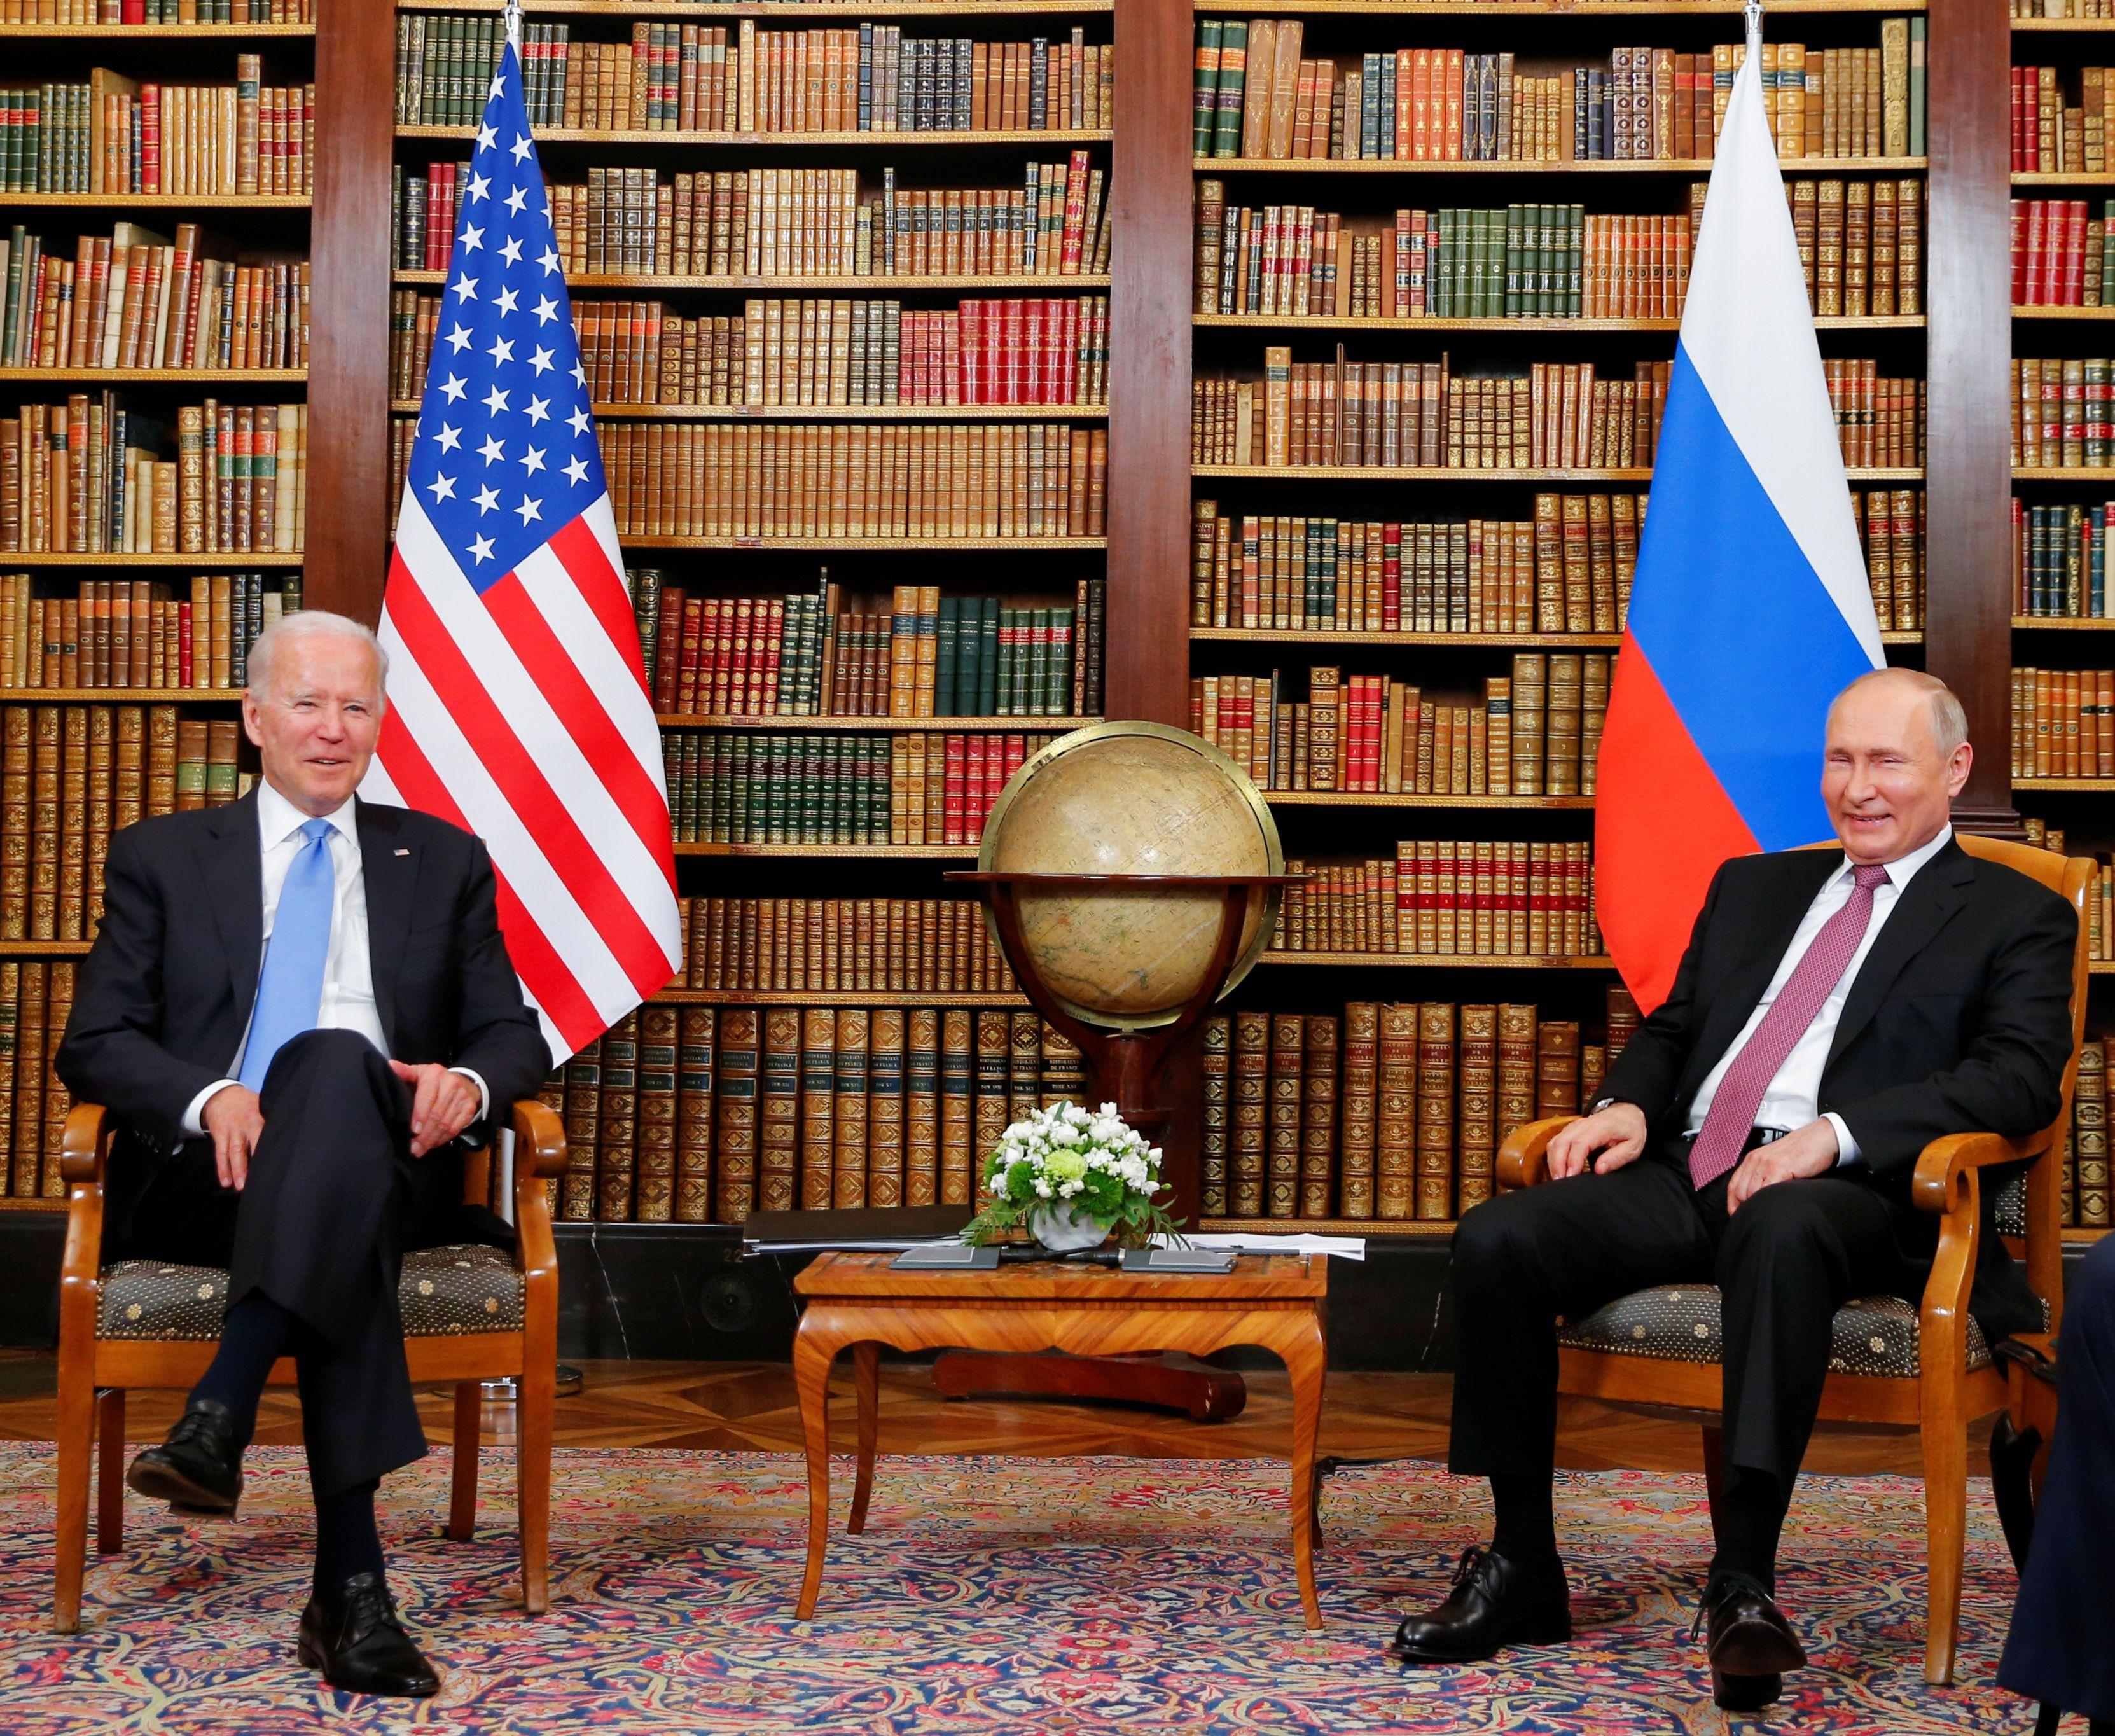 U.S. President Joe Biden and Russia's President Vladimir Putin meet for the U.S.-Russia summit at Villa La Grange in Geneva, Switzerland, June 16, 2021. REUTERS/Denis Balibouse/Pool